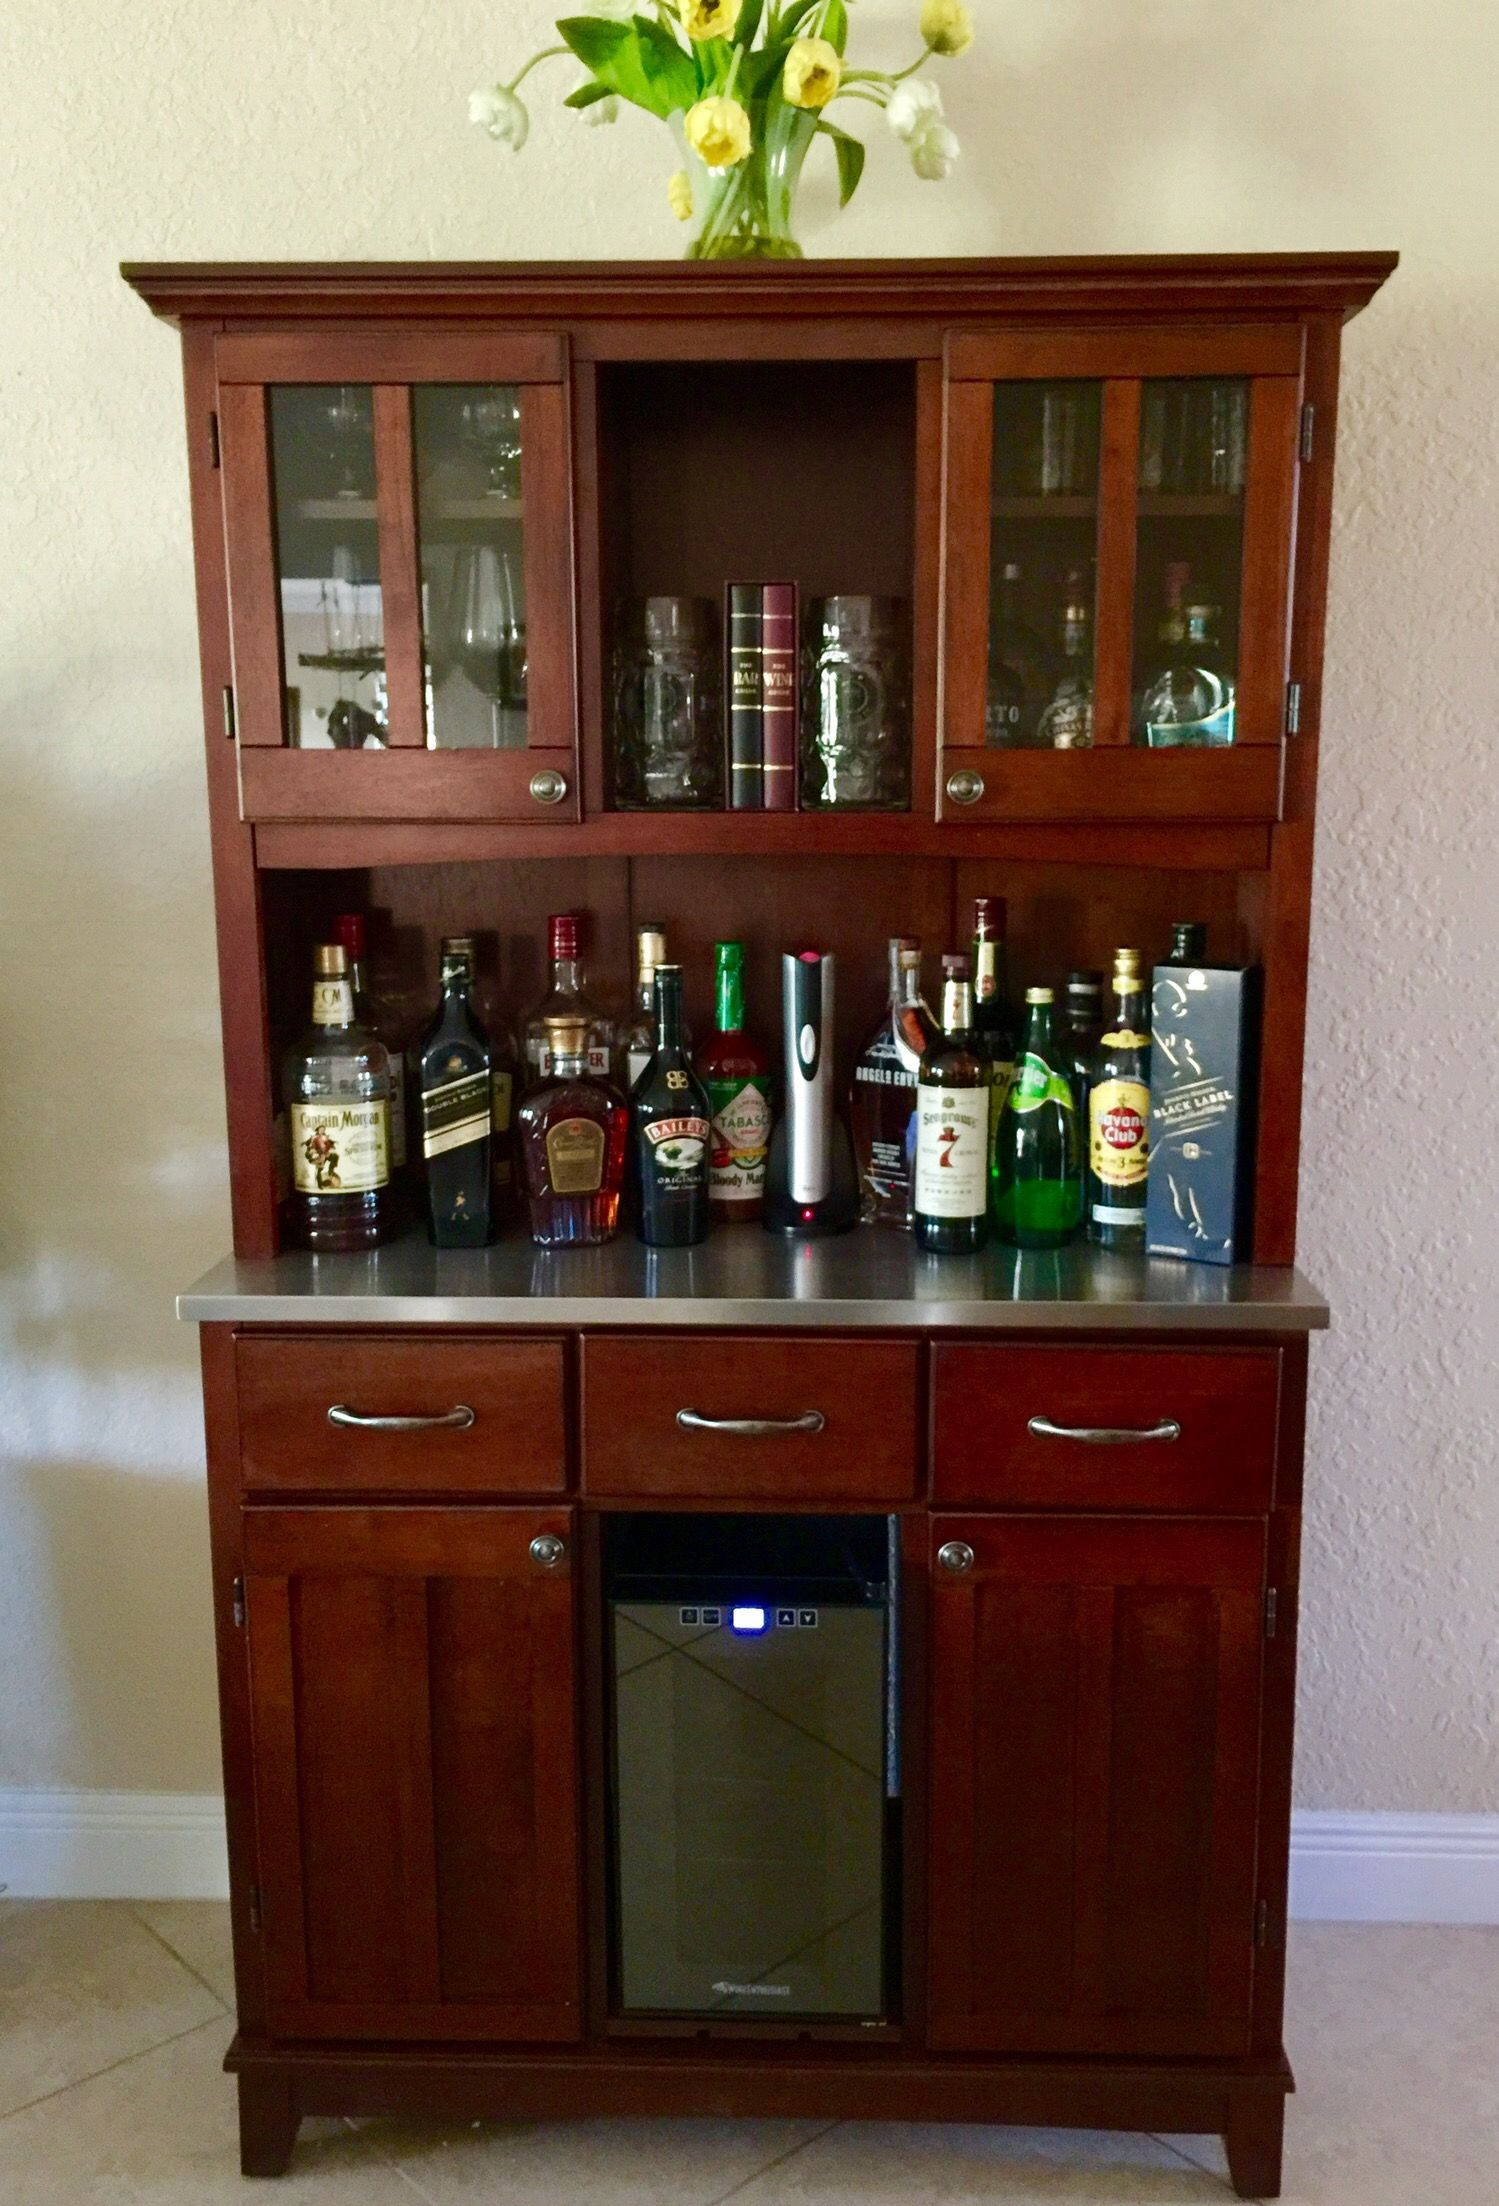 Farm Buffet Liquor Cabinet Stores all of our liquor, Stein, Wine ...